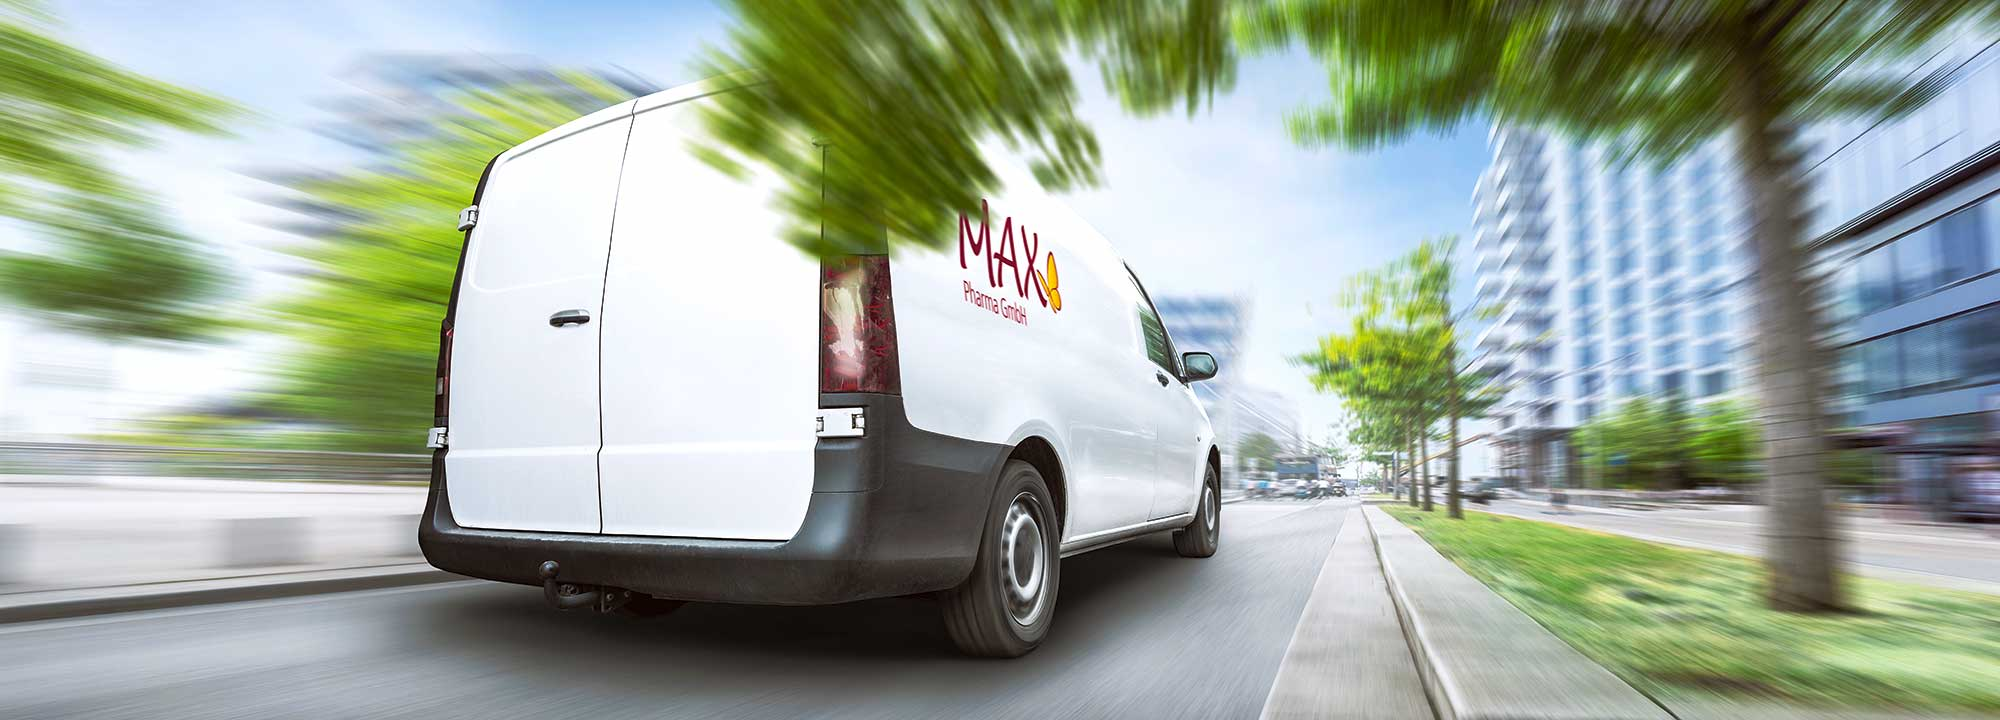 Max Pharma – partner for pharmacies and hospitals